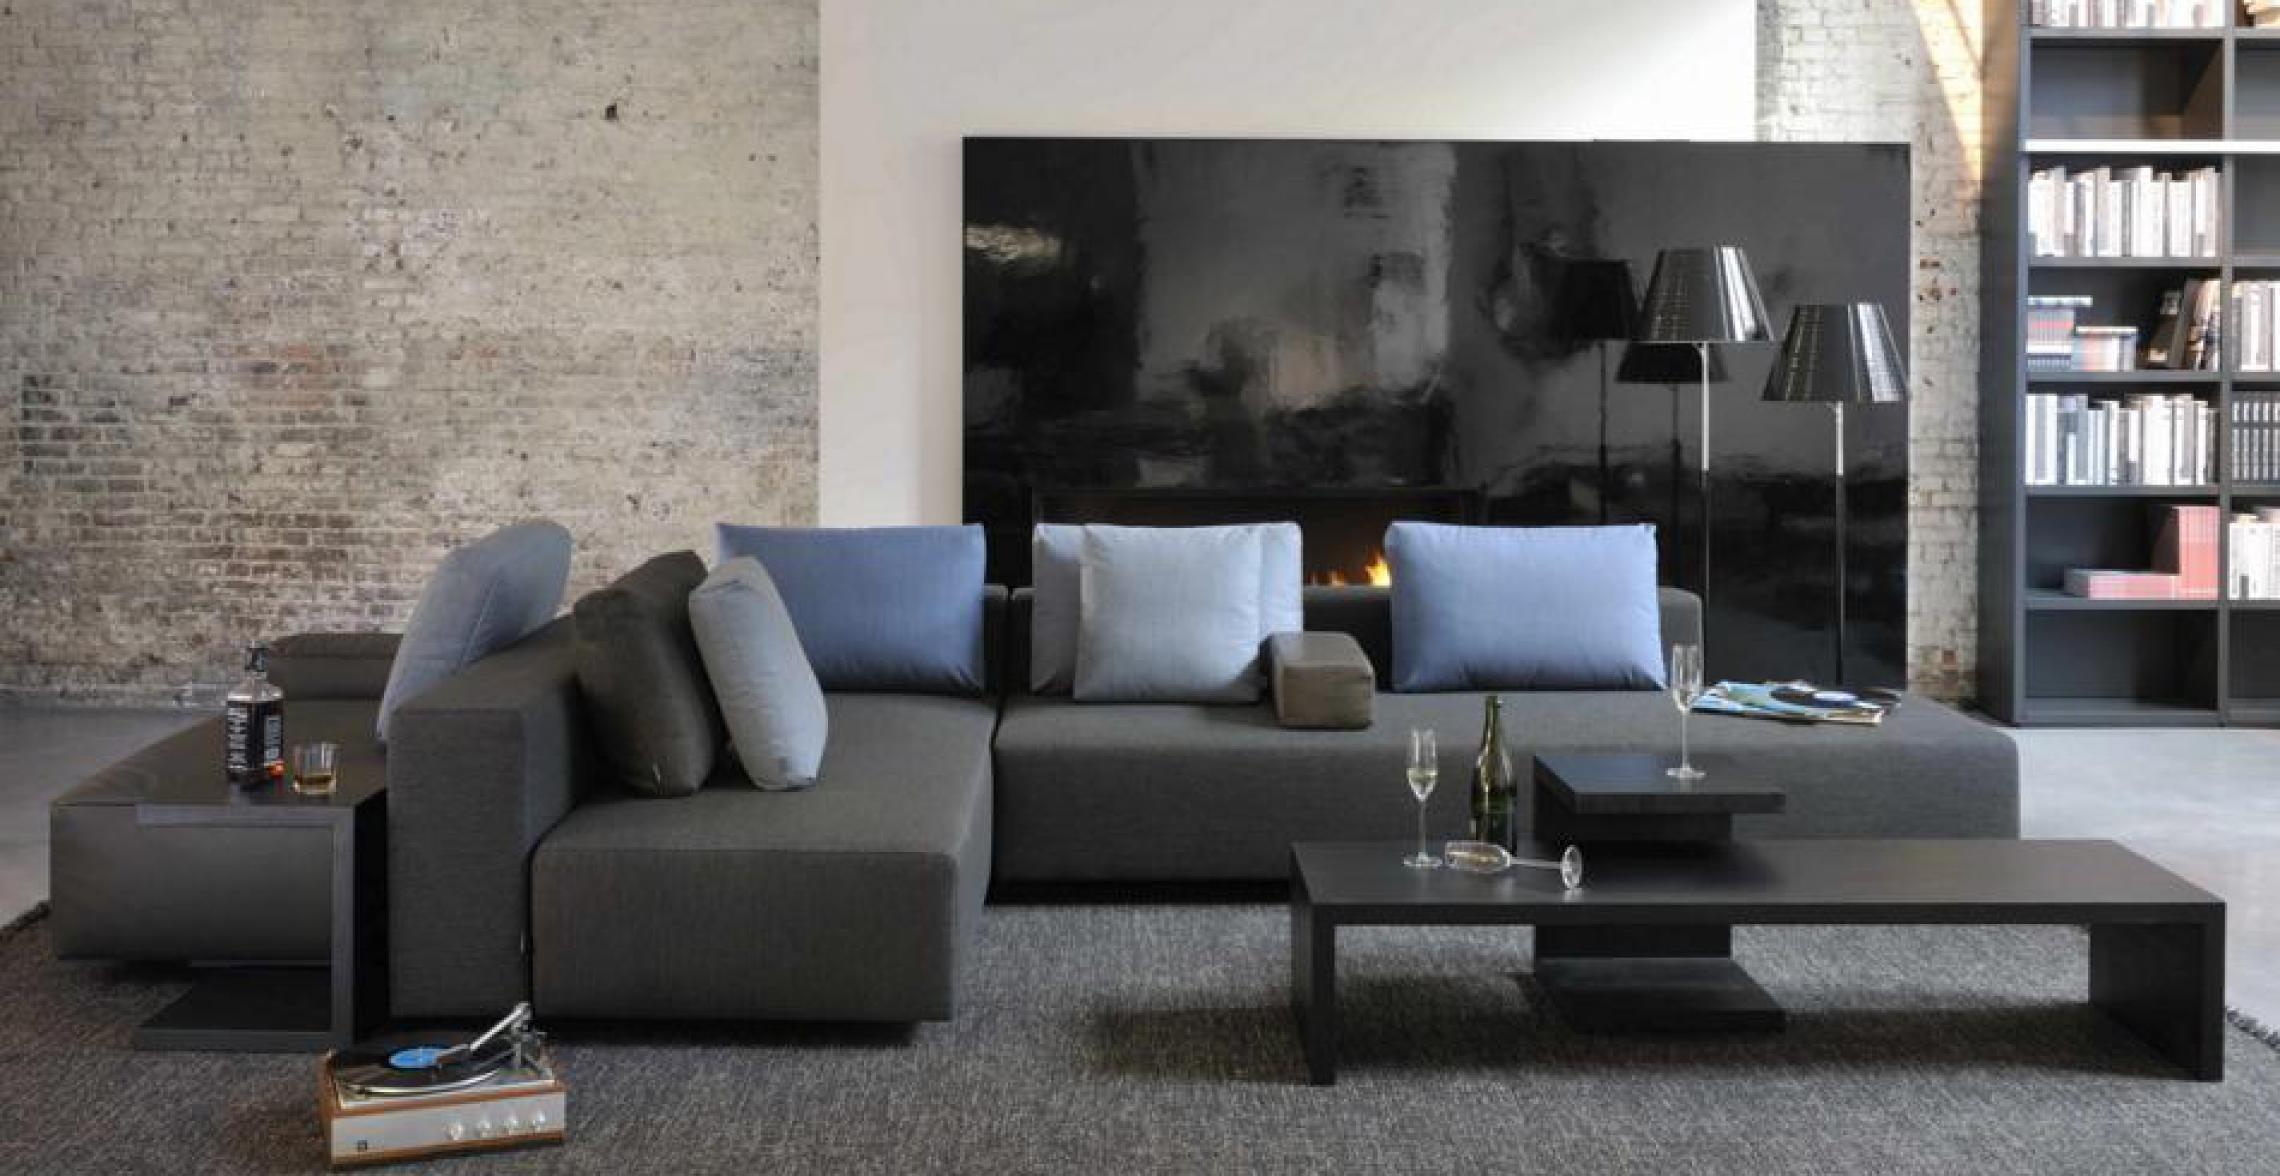 Design meubelen interieur plus peer design eetkamers salons